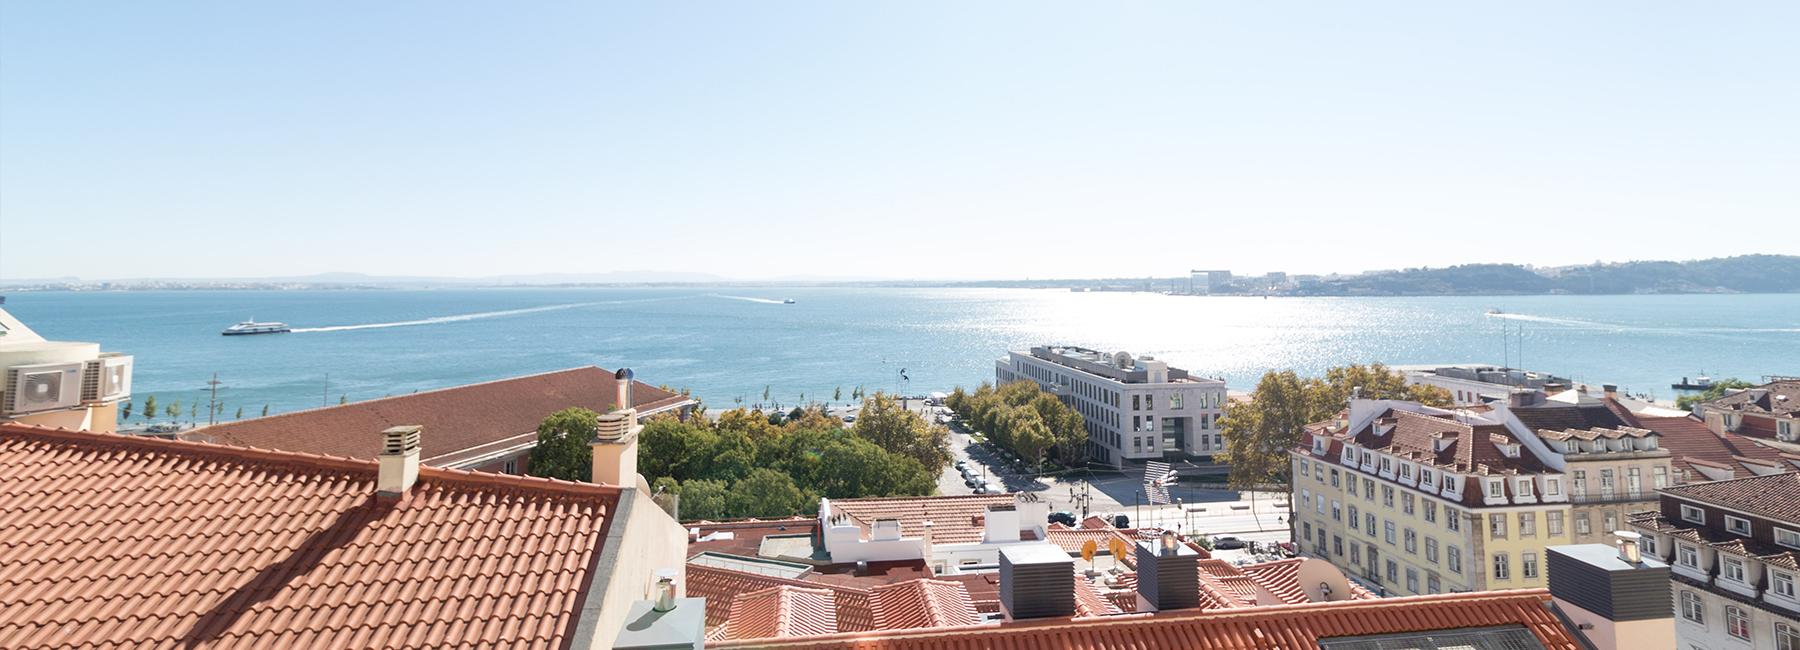 <a href='http://www.castelhana.pt/imovel/apartamento-t4-no-chiado-lisboa/?rid=7184757' target='_blank'>Chiado - 4-Bedroom apartment</a>